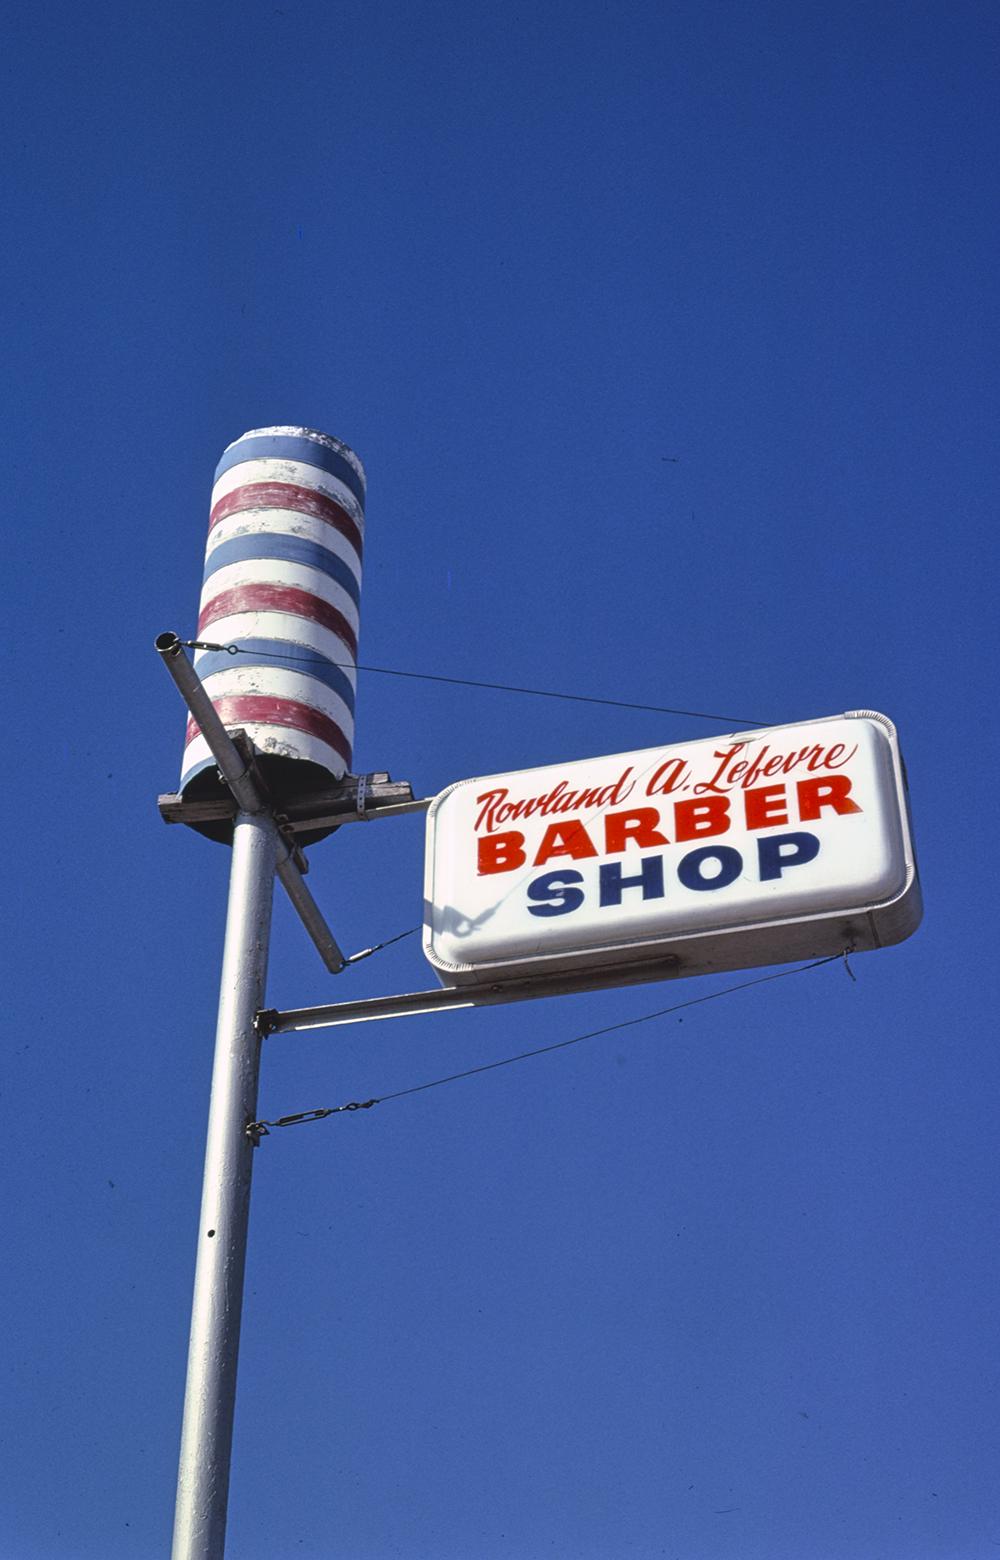 Barber pole in Abilene, Texas, 1979. Photograph by John Margolies.